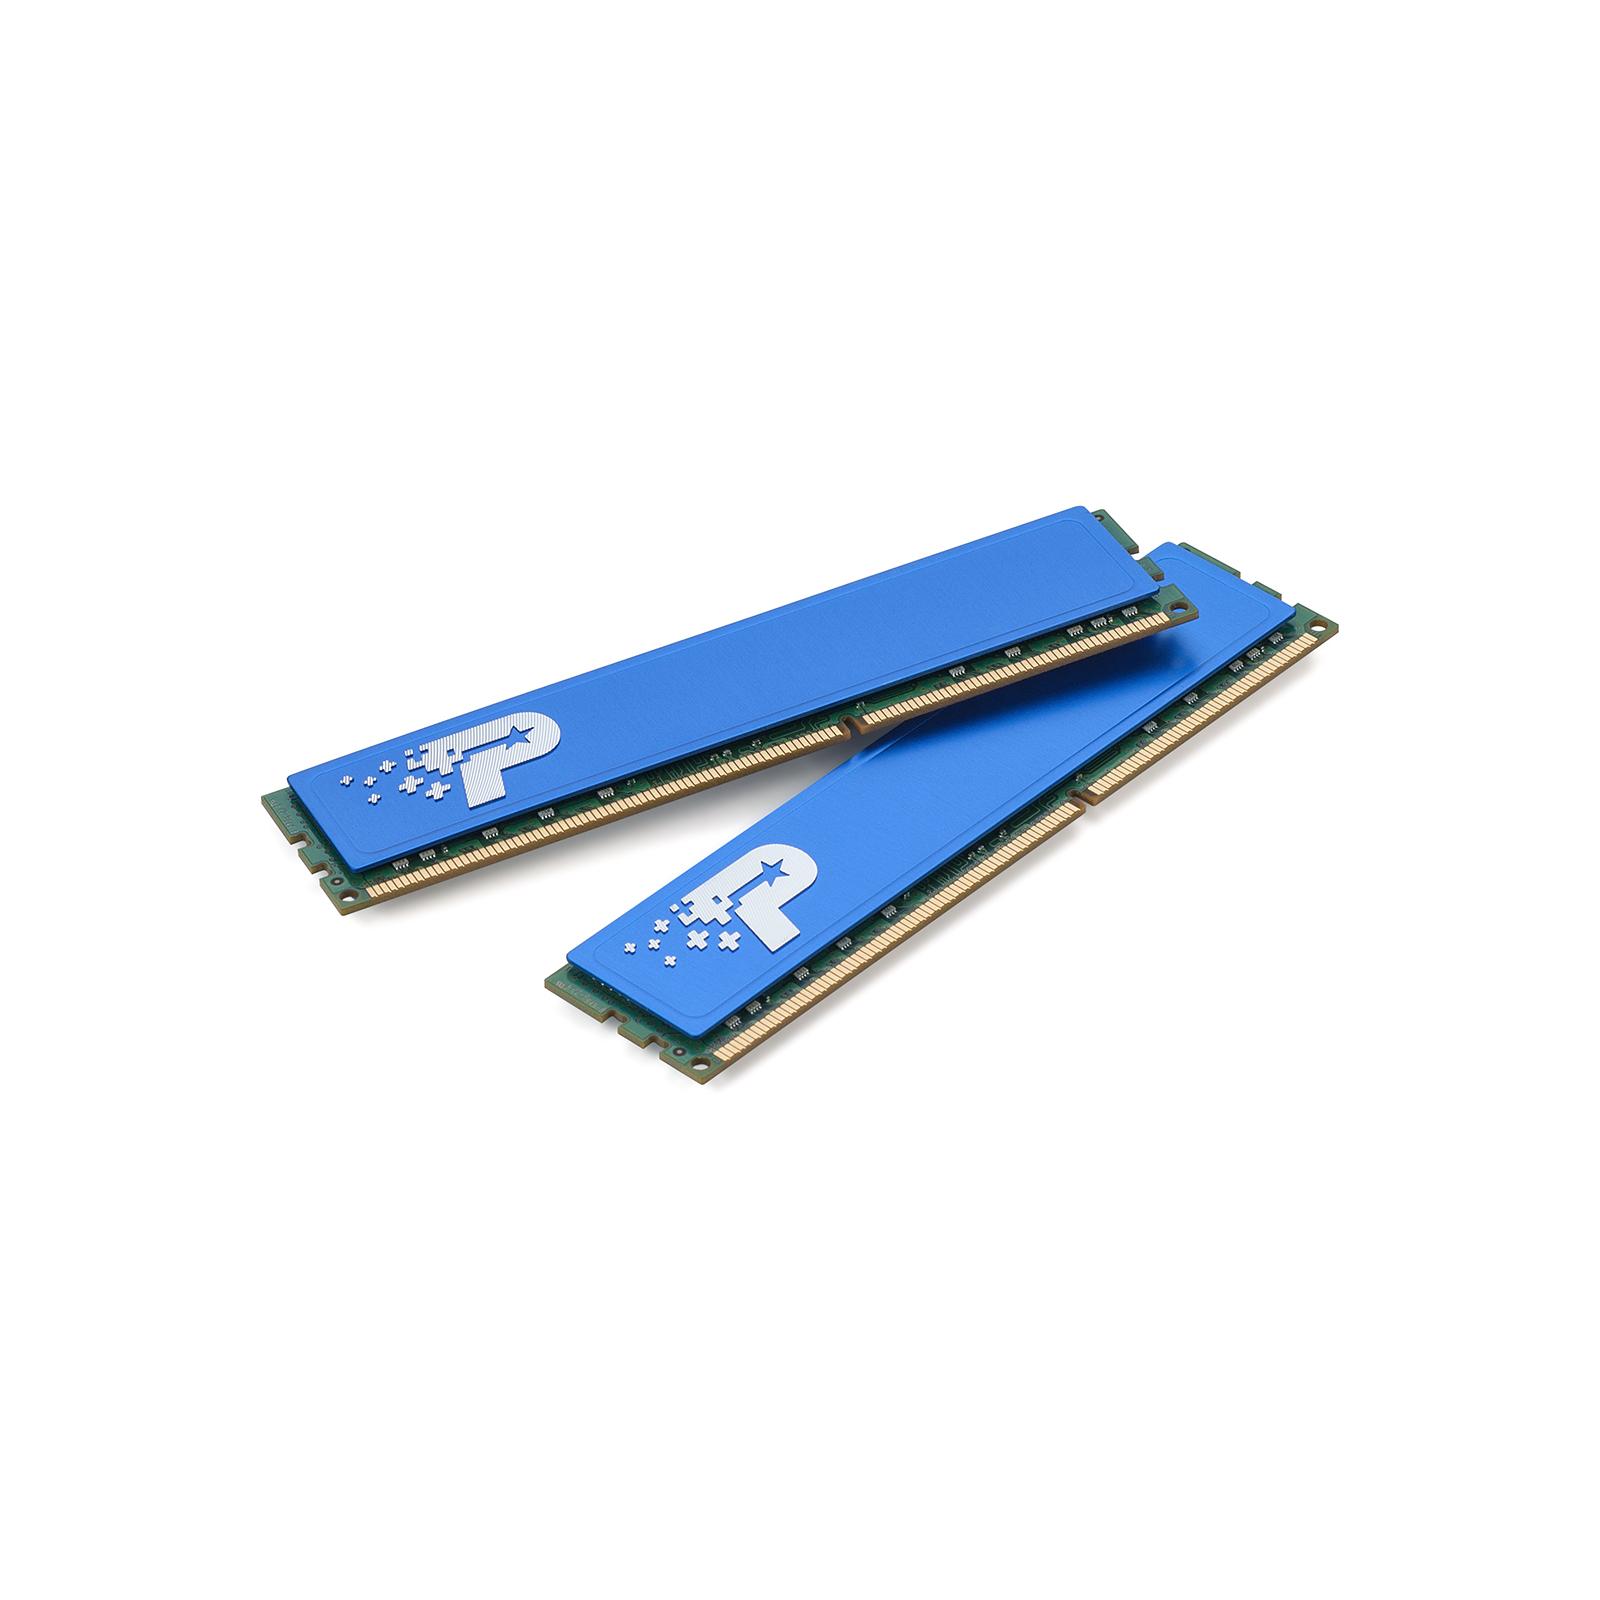 Модуль памяти для компьютера DDR3 16GB (2x8GB) 1600 MHz Signature Line Patriot (PSD316G1600KH)